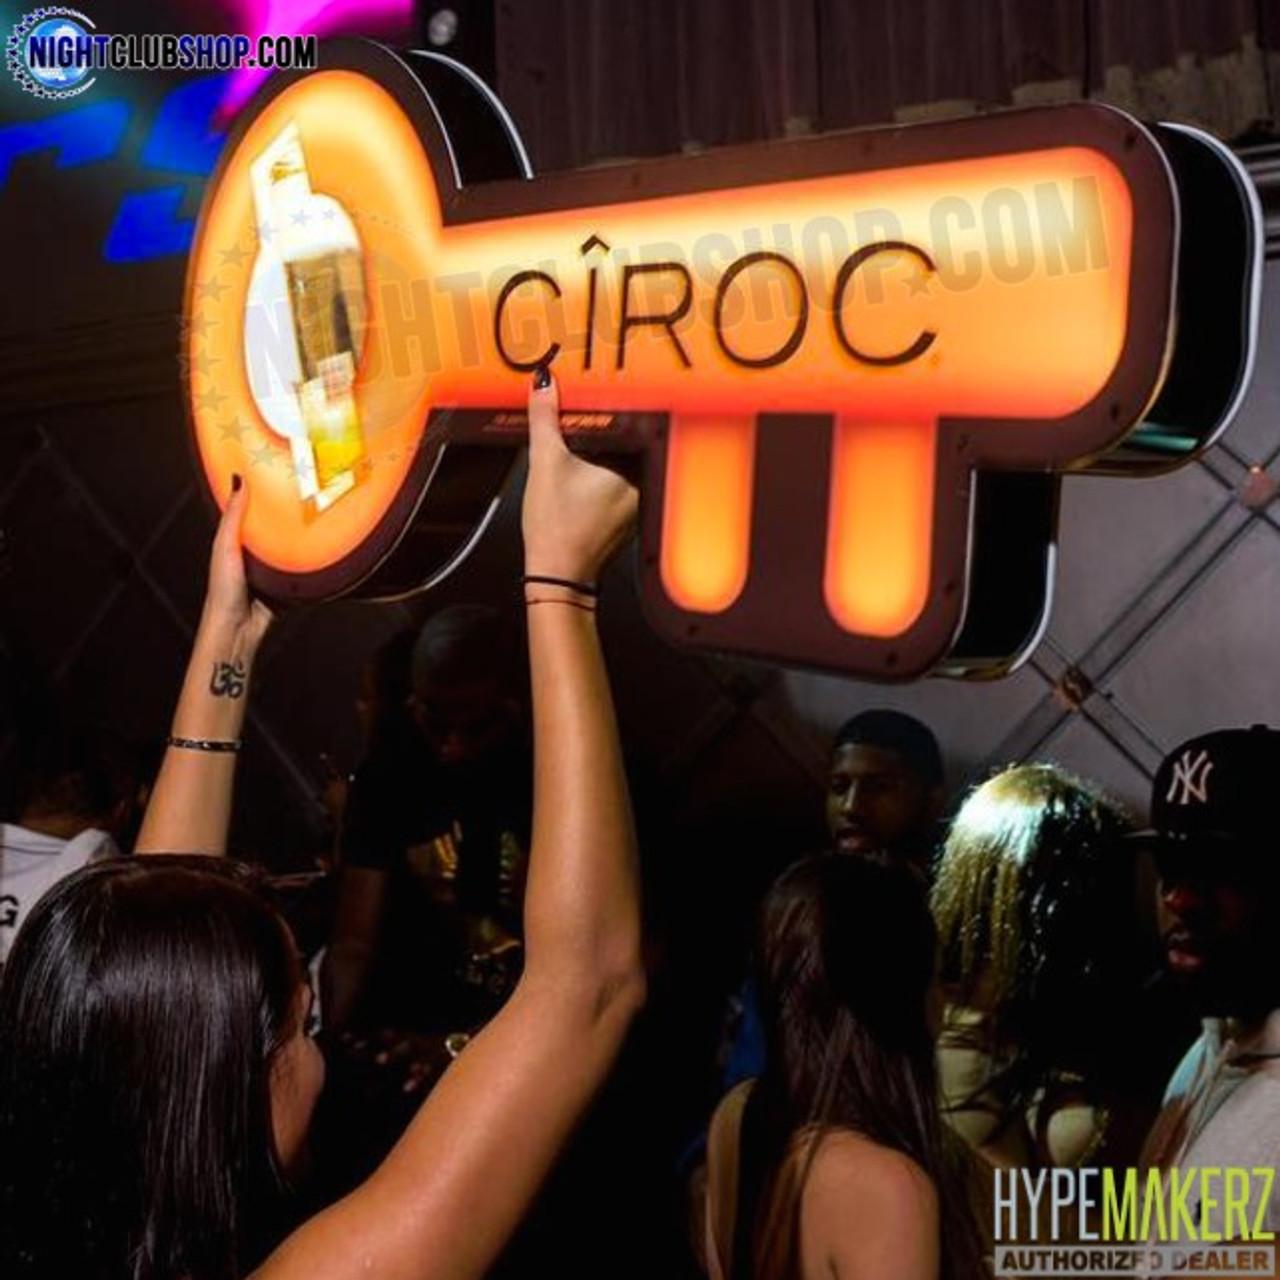 Ciroc, LED, Bottle, Presenter, Liquor, Holder, VIP, Service, Delivery, Huge, Enormous, Gigantic, Key, Nightclub, Nightlife,